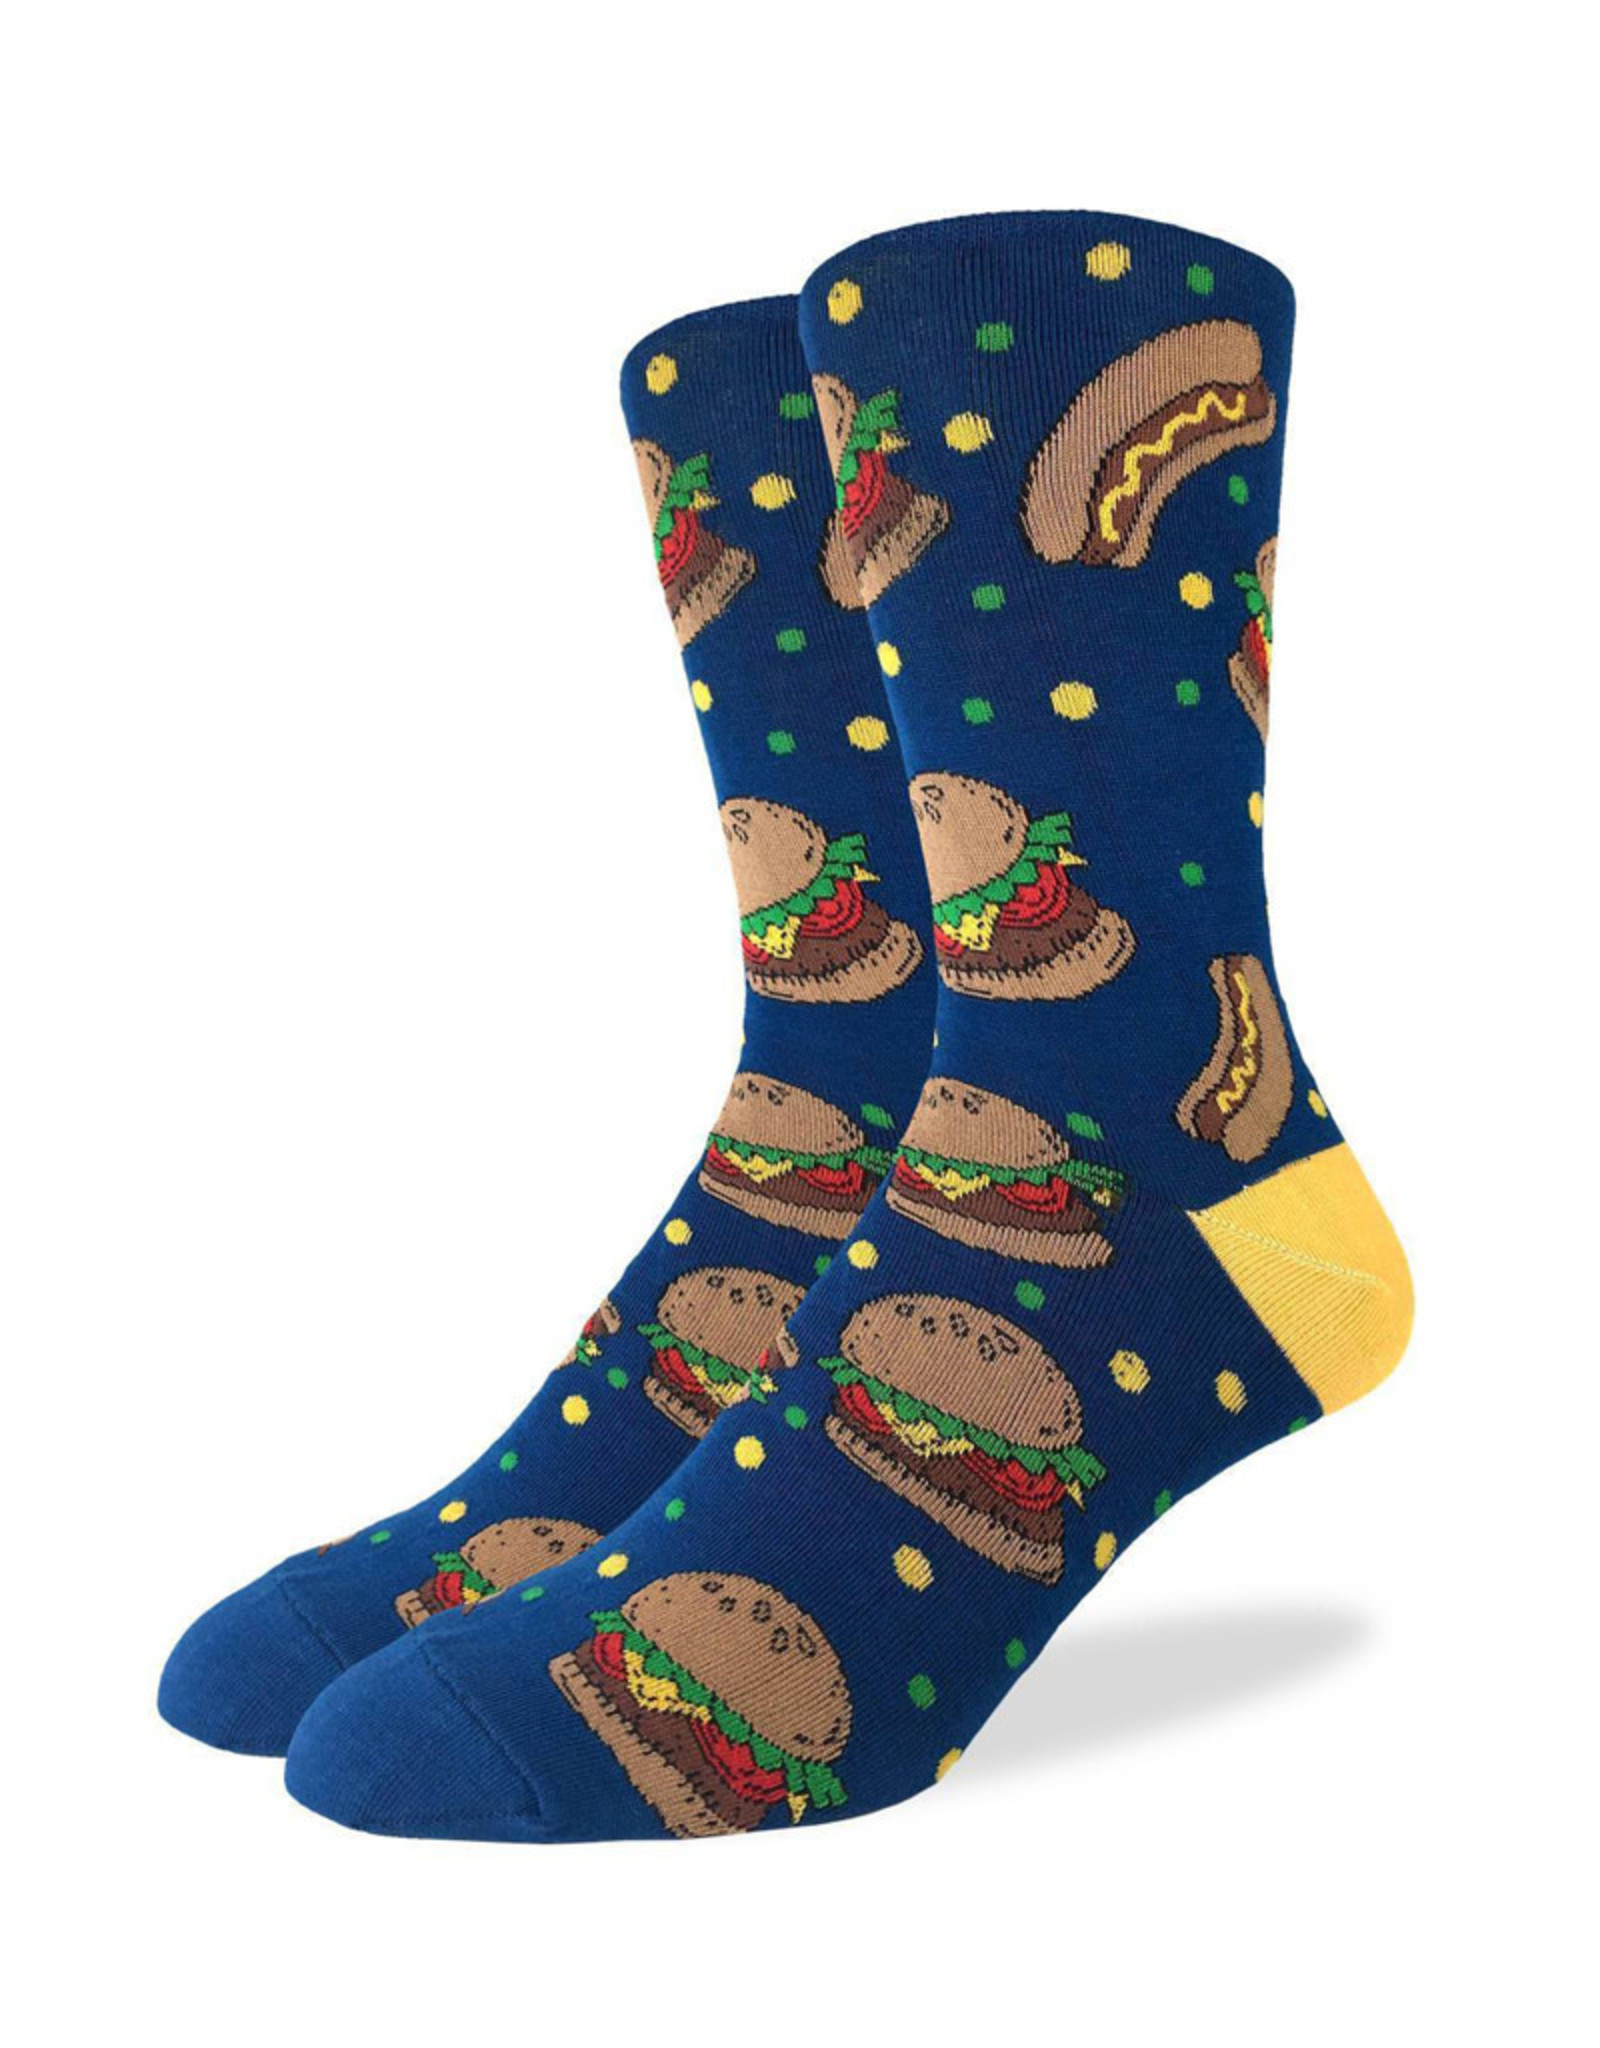 Burgers & Hot Dogs ( Good Luck Sock Socks )